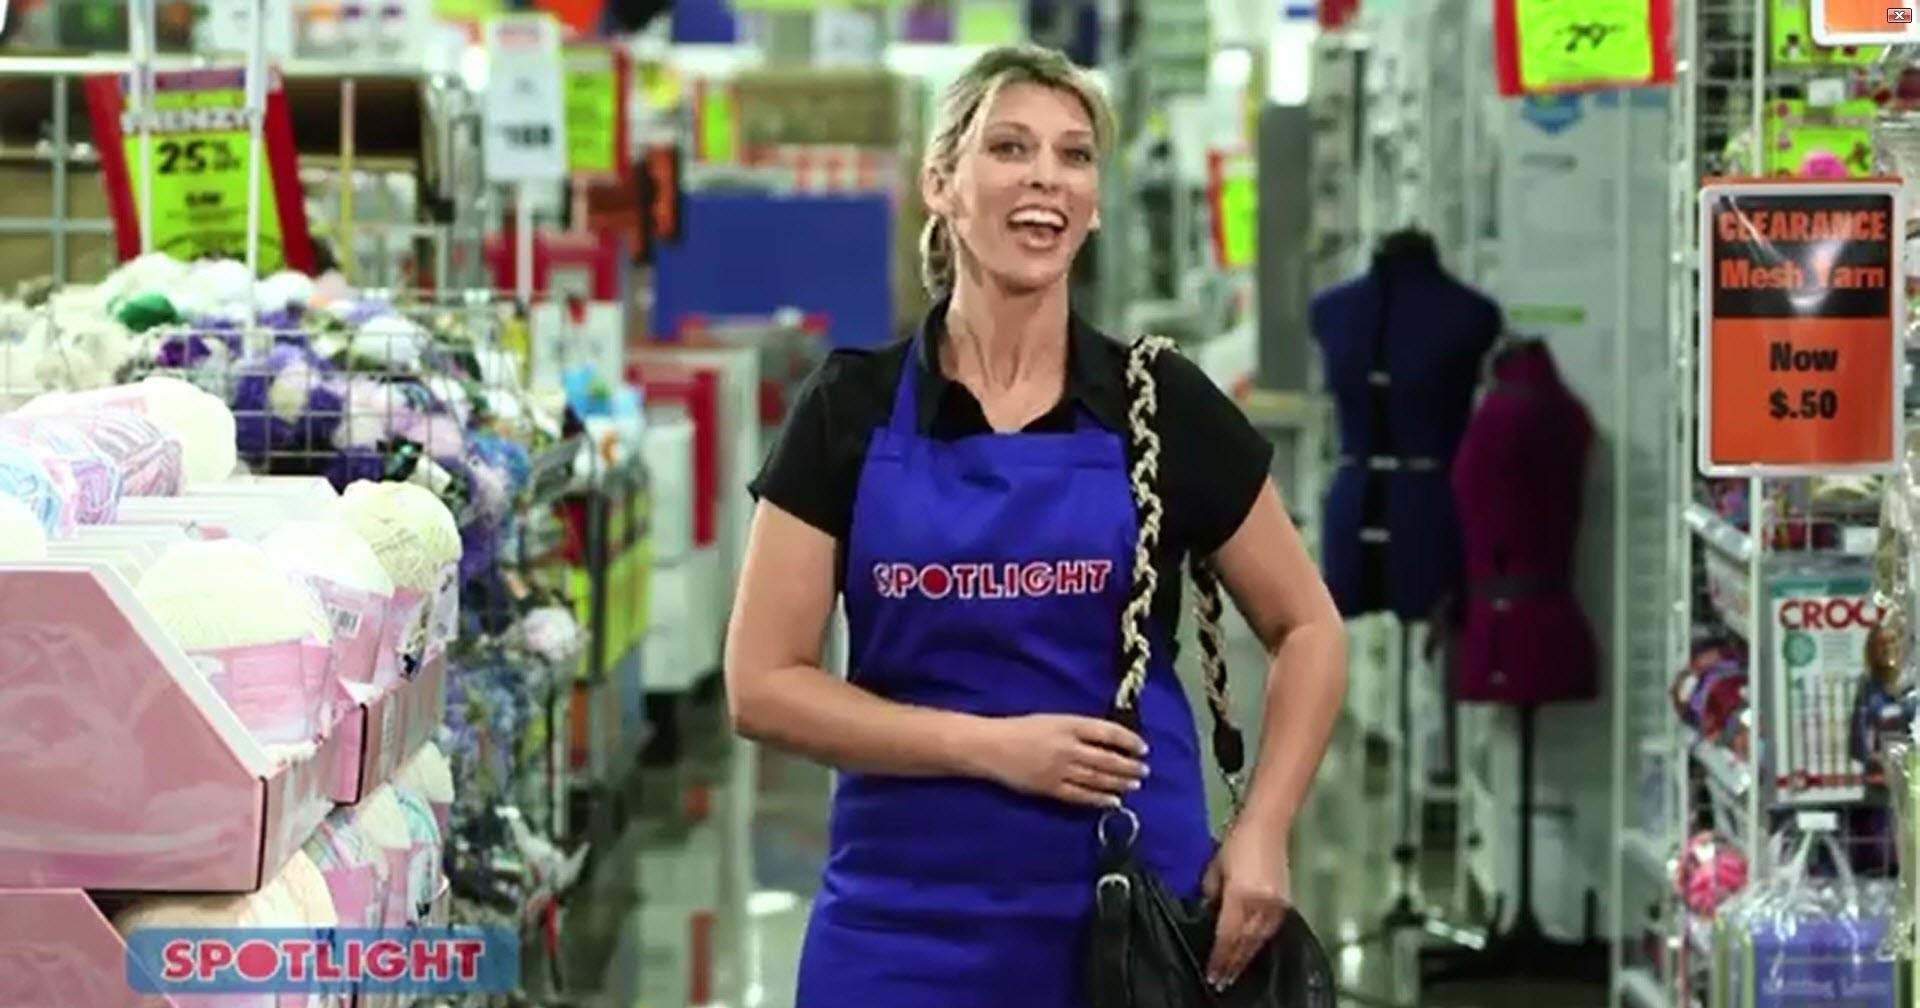 Spotlight DIY - Video Cord Accessories (Bag Strap)